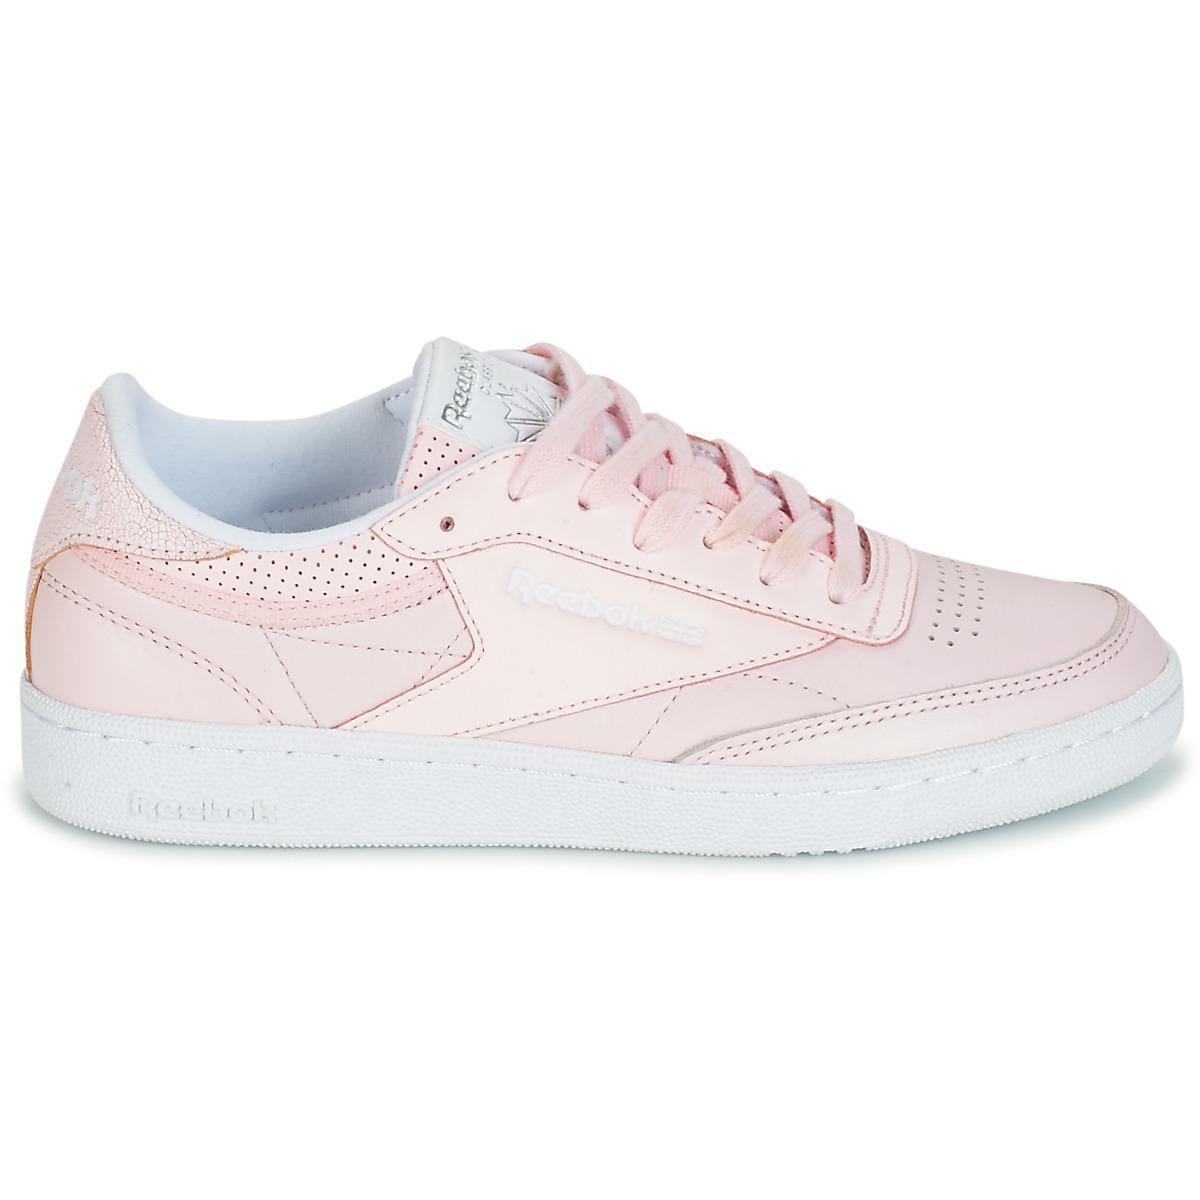 82b8ae96189 Reebok - Club C 85 Fbt Women s Shoes (trainers) In Pink - Lyst. View  fullscreen